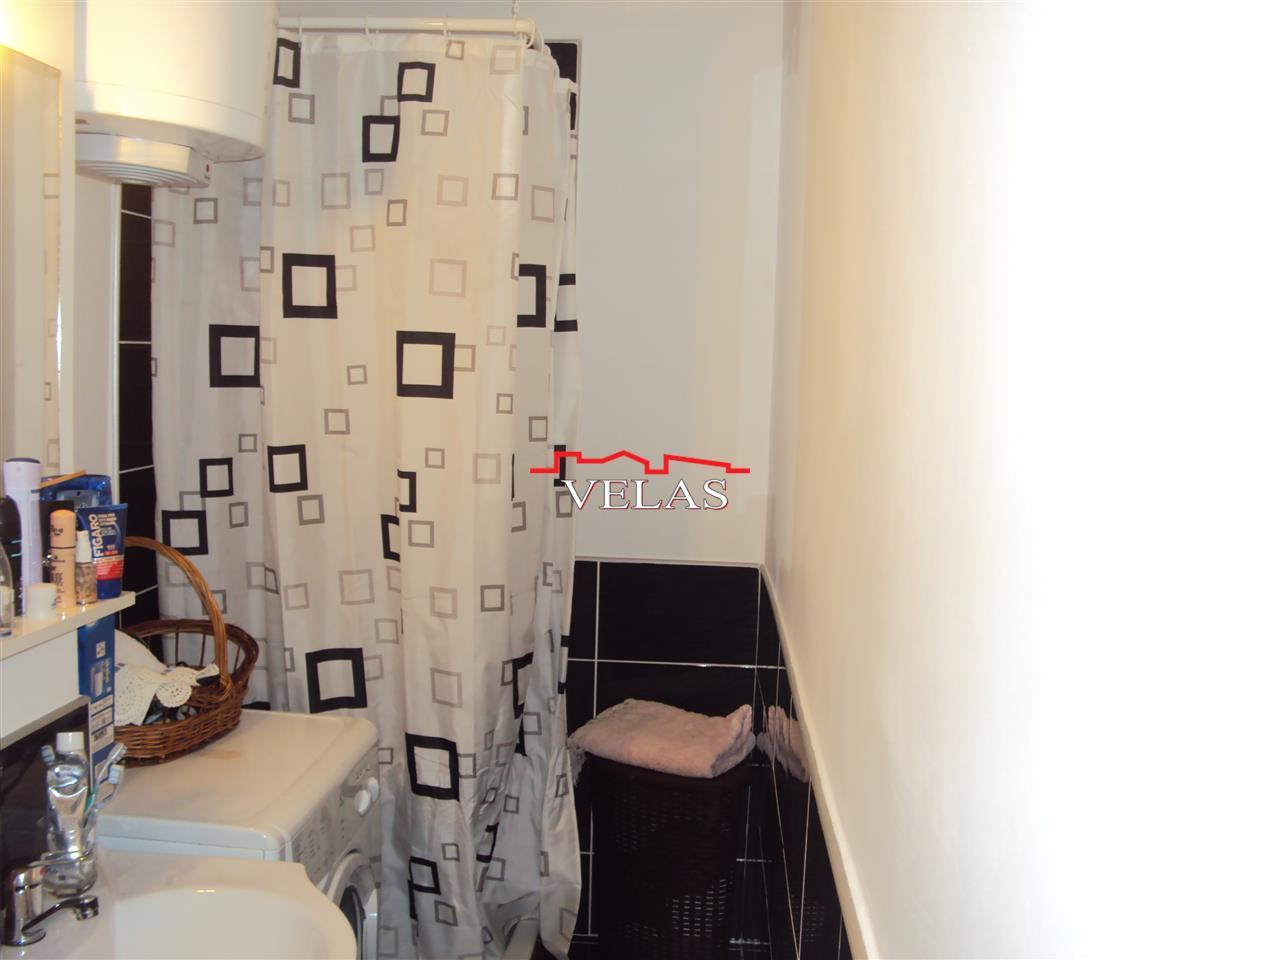 Apartament 2 camere, et. 4, renovat si mobilat,Oras Marasesti